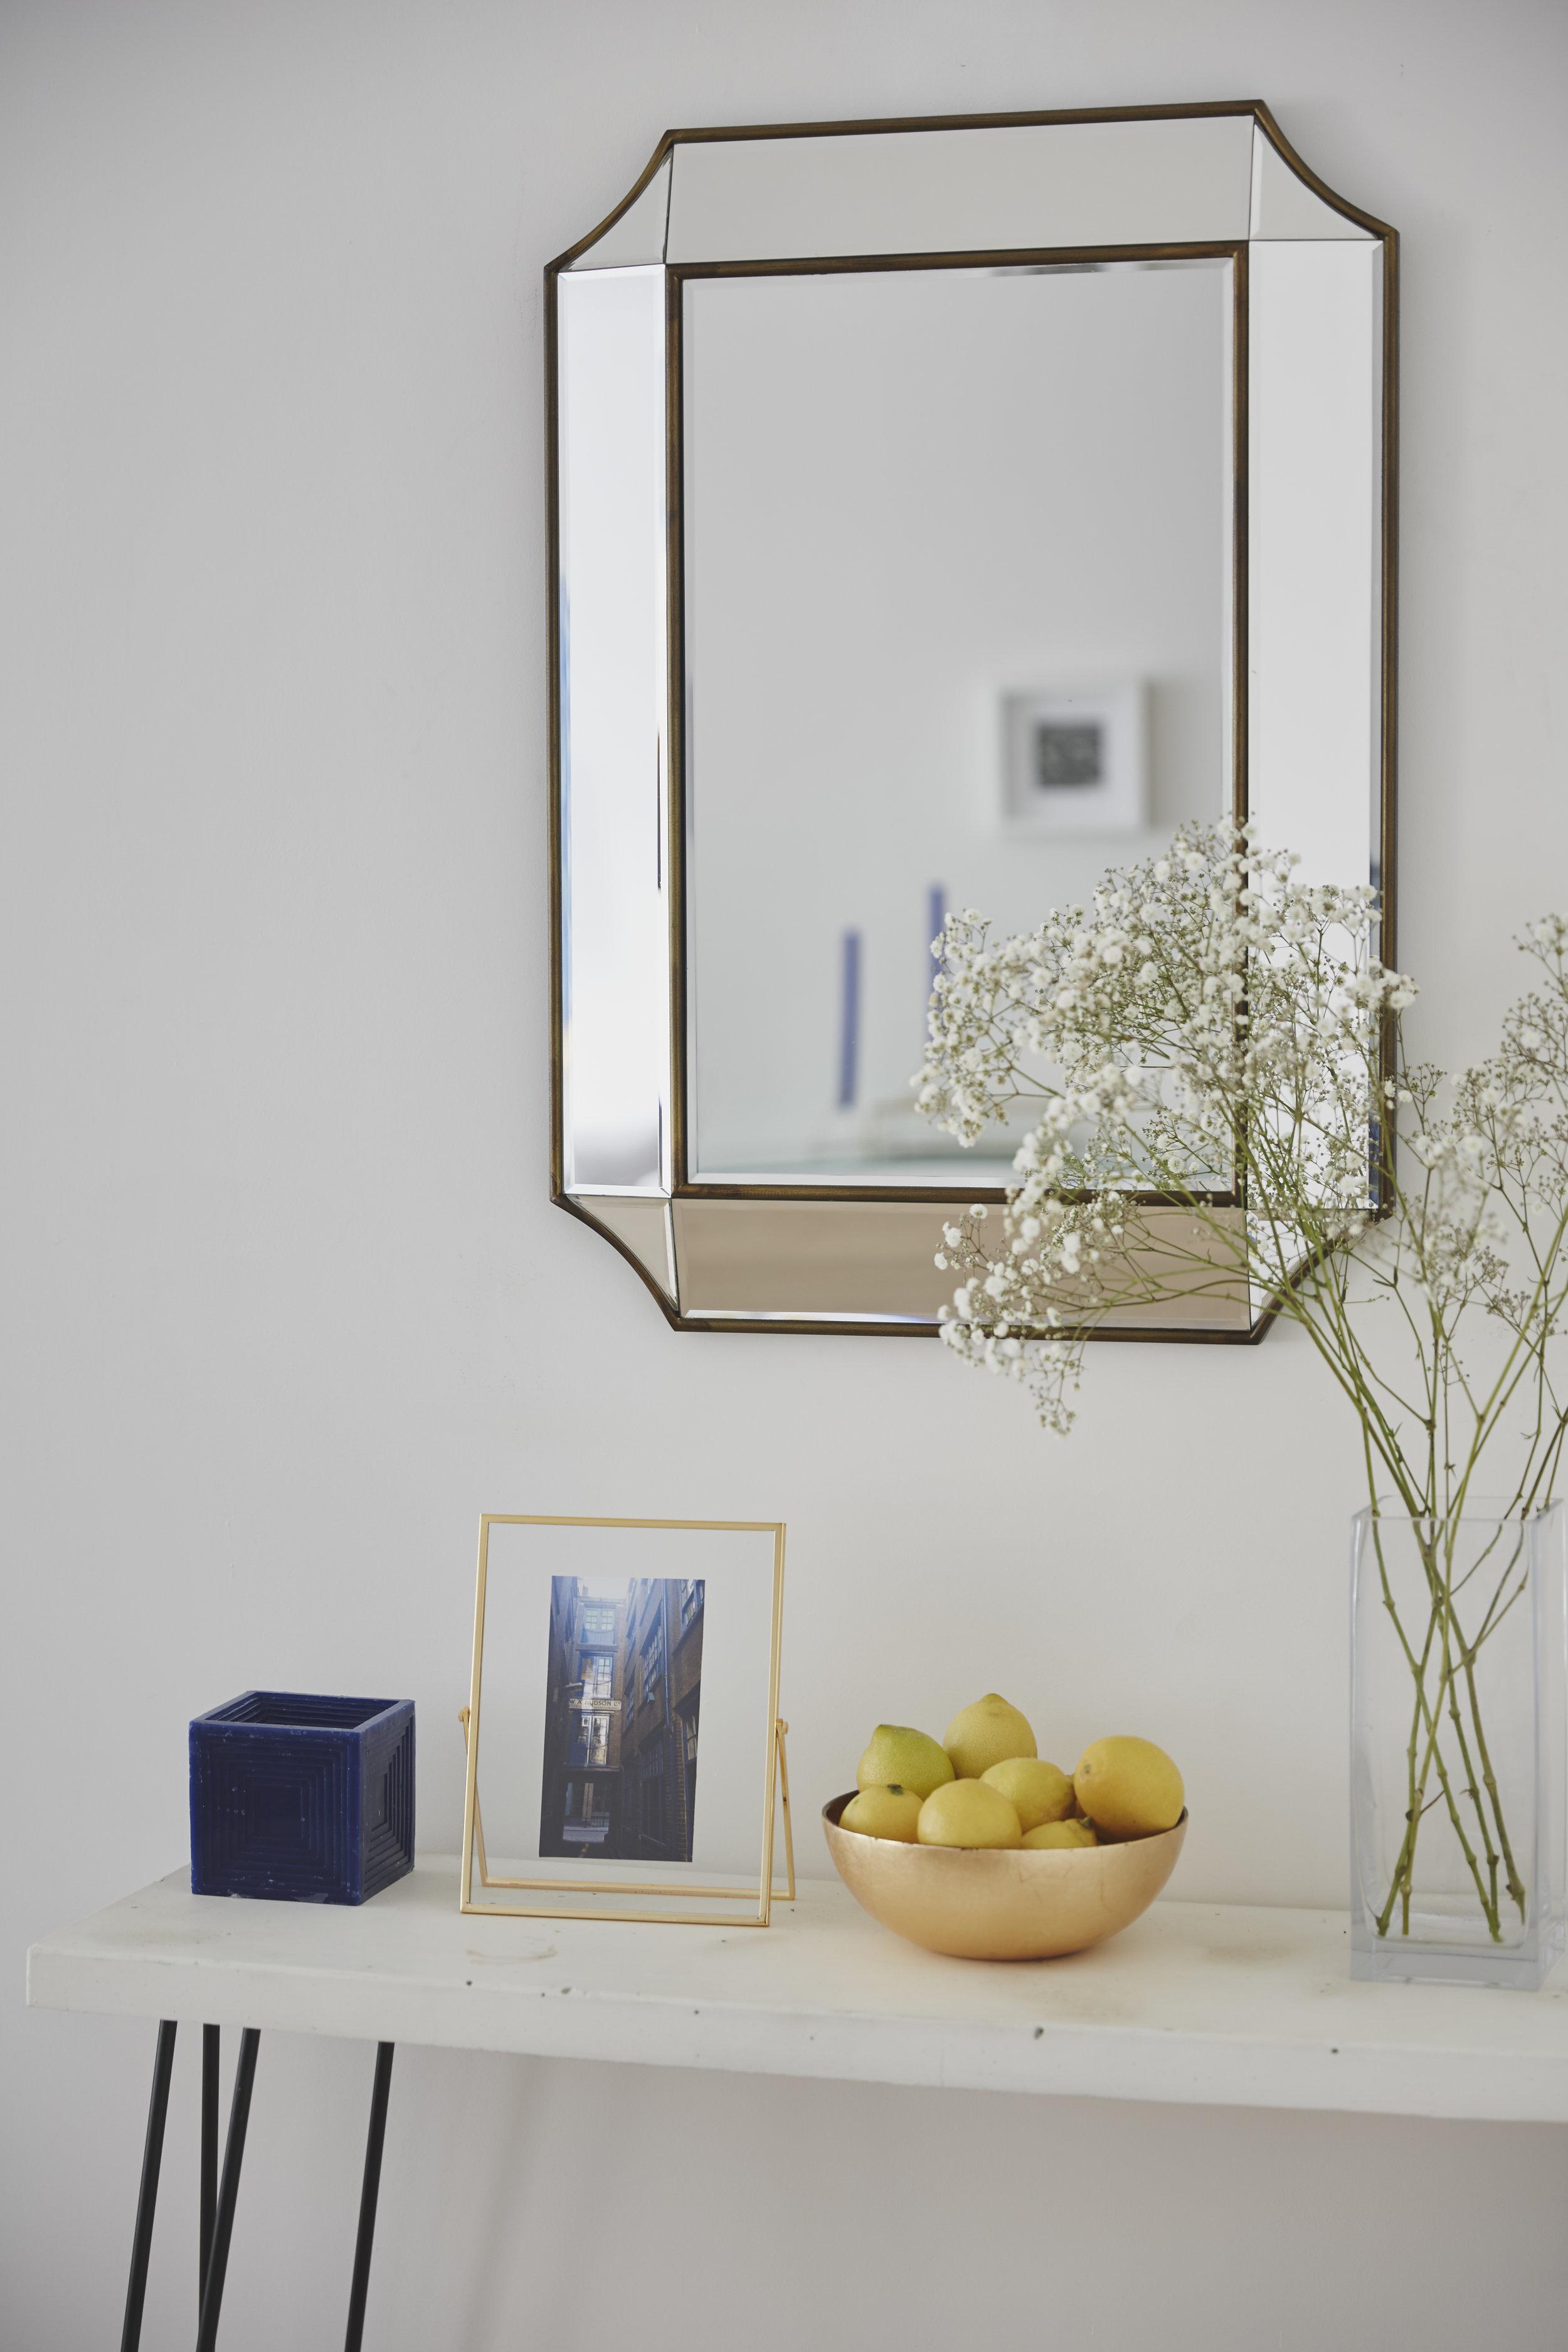 Stylish Living Room Interiors Cuckooz Shoreditch Studionatalie Natalie Papageorgiadis